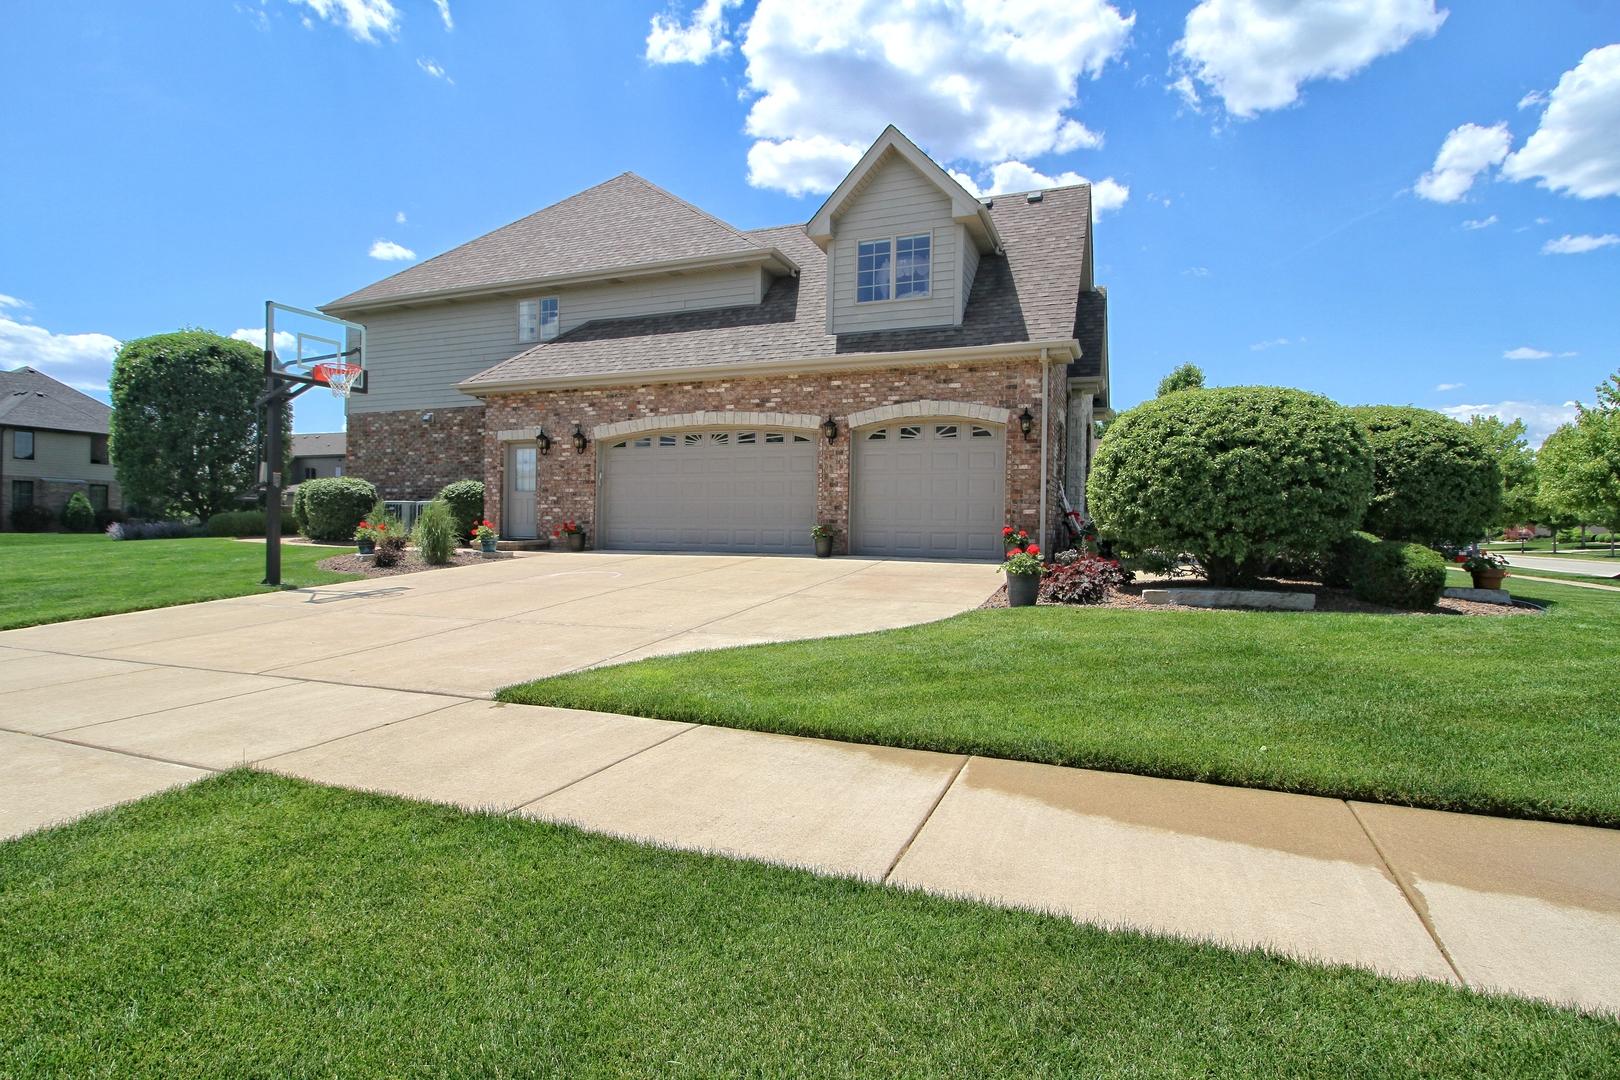 11035 Siena, FRANKFORT, Illinois, 60423